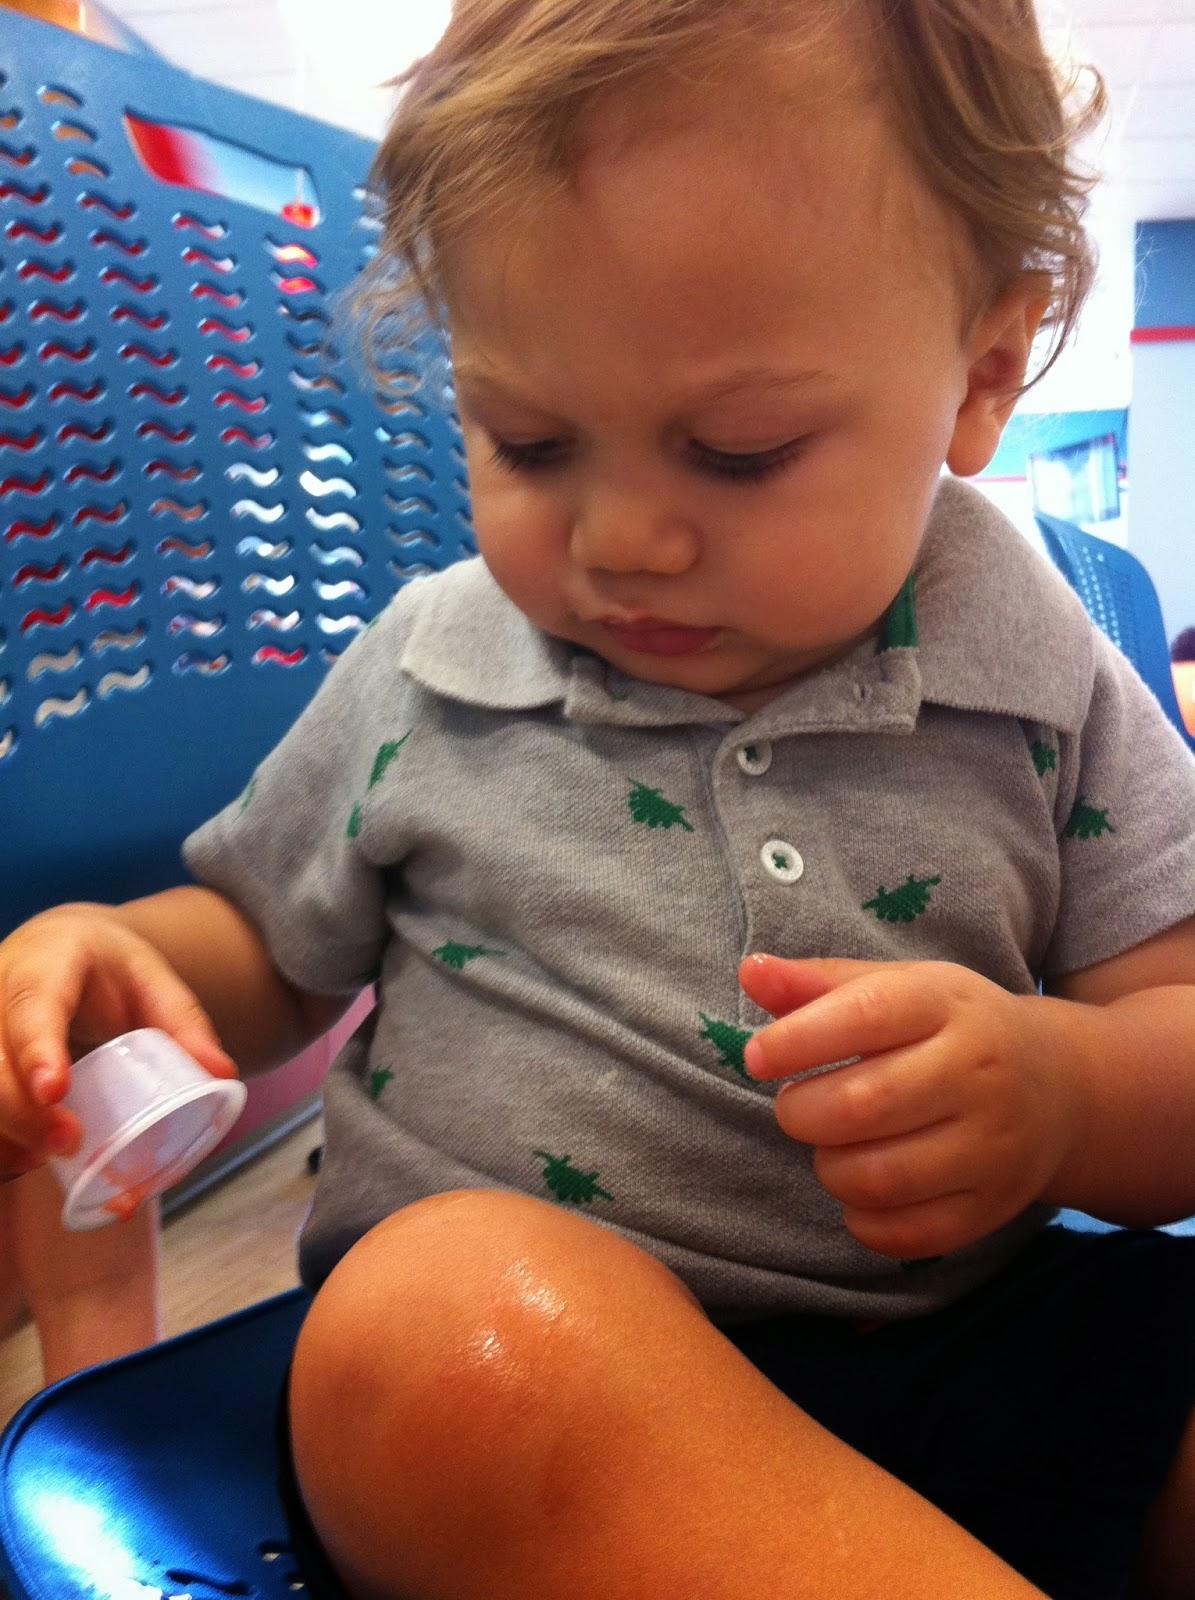 Picture of Sincerely yogurt Charlie spilling on himself